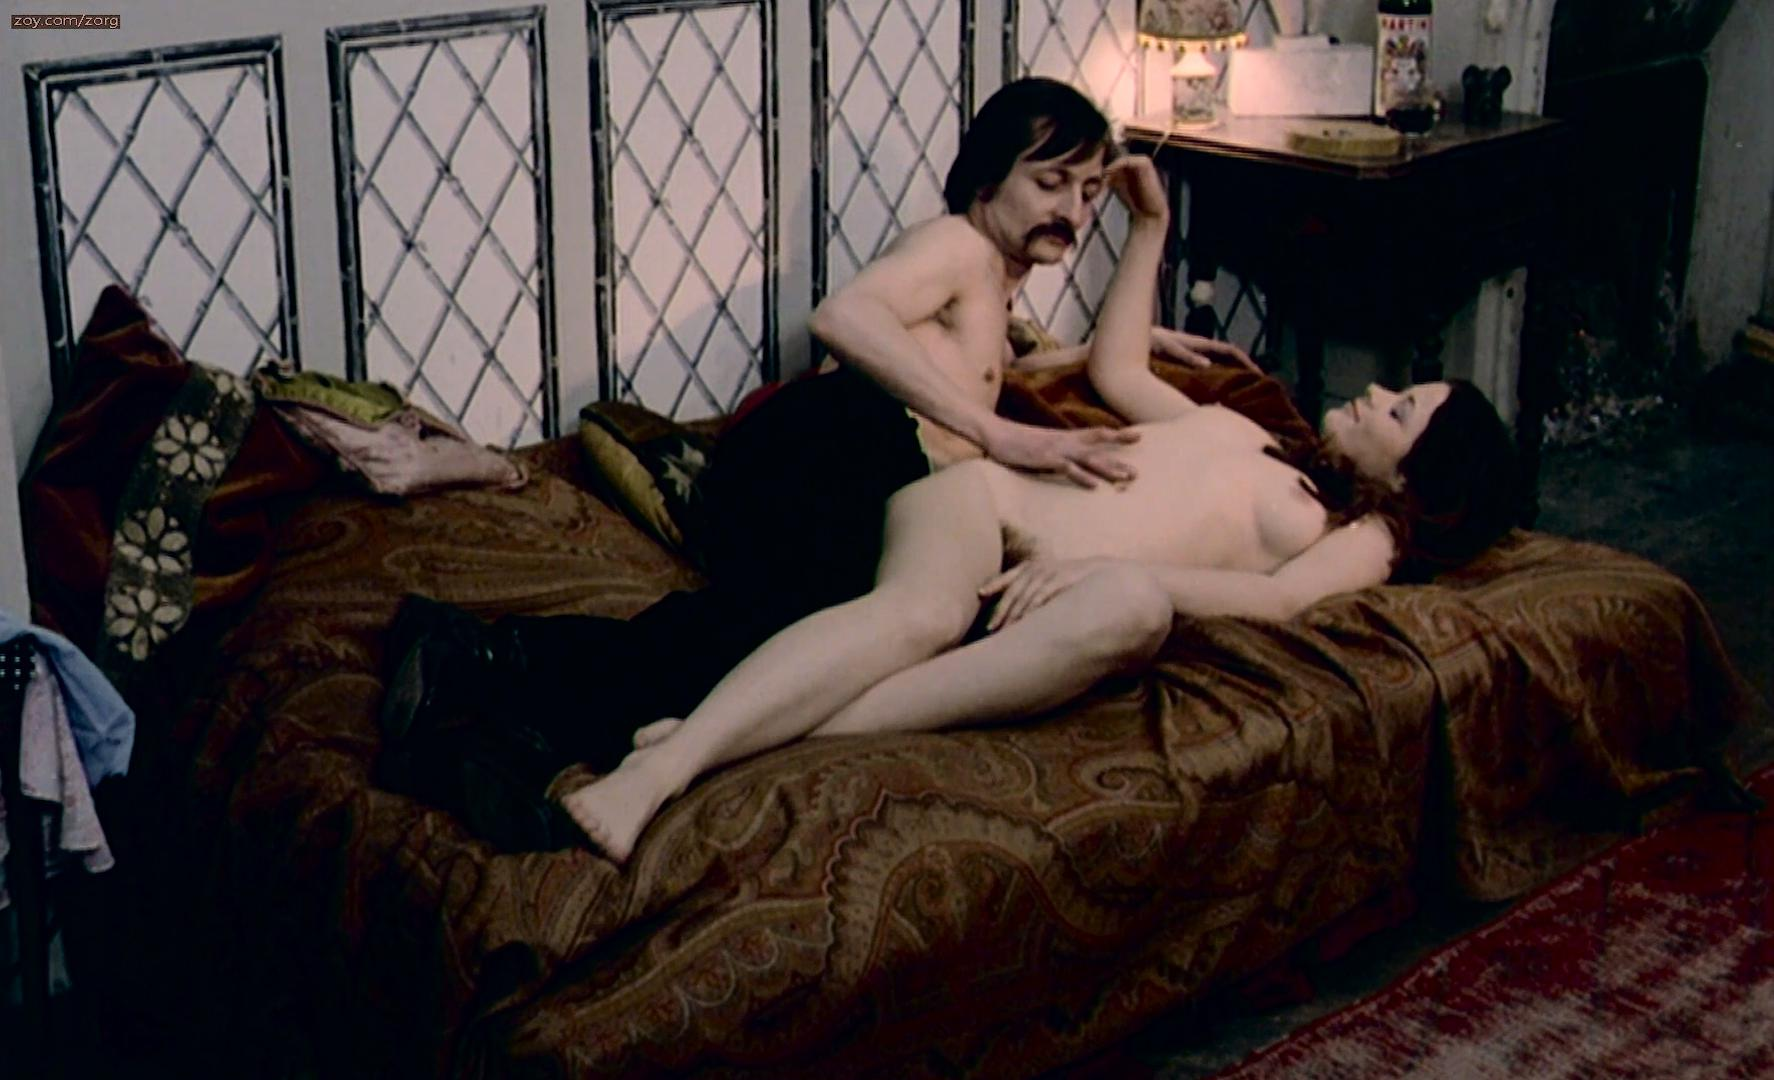 Joelle Coeur nude, Gilda Arancio nude - Schoolgirl Hitchhikers (1973)